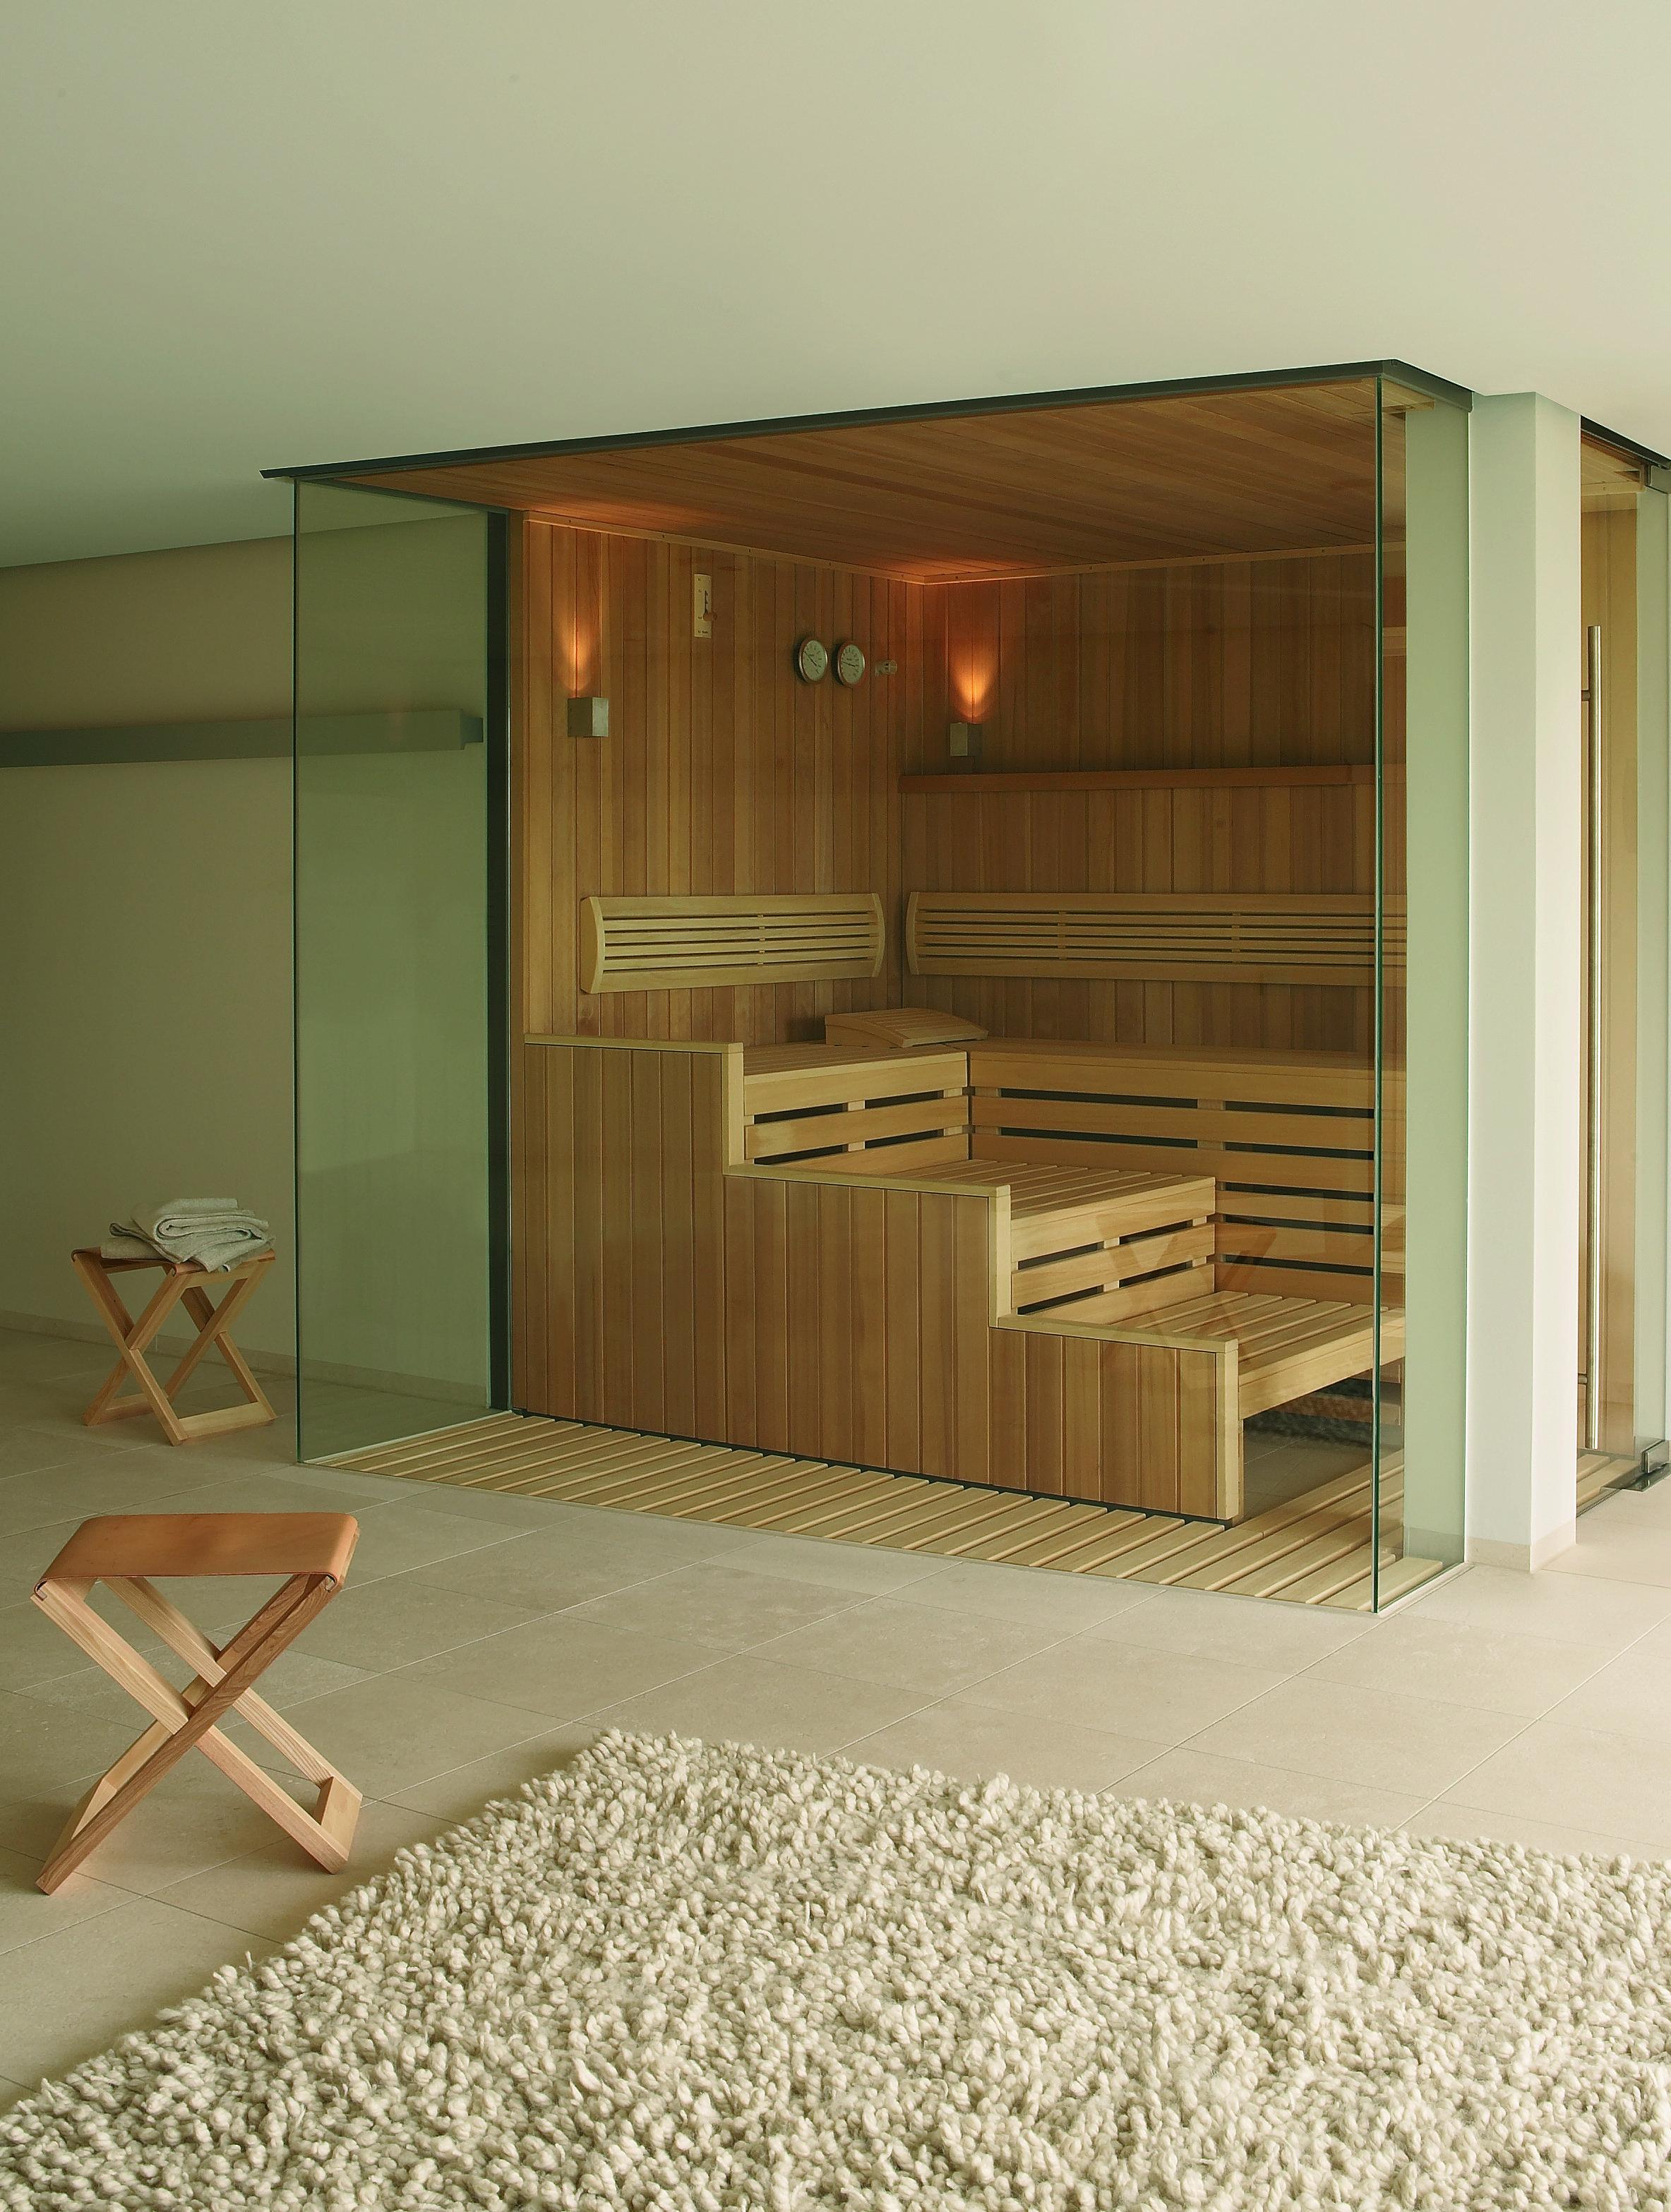 klafs gmbh co kg ostseesuche com. Black Bedroom Furniture Sets. Home Design Ideas